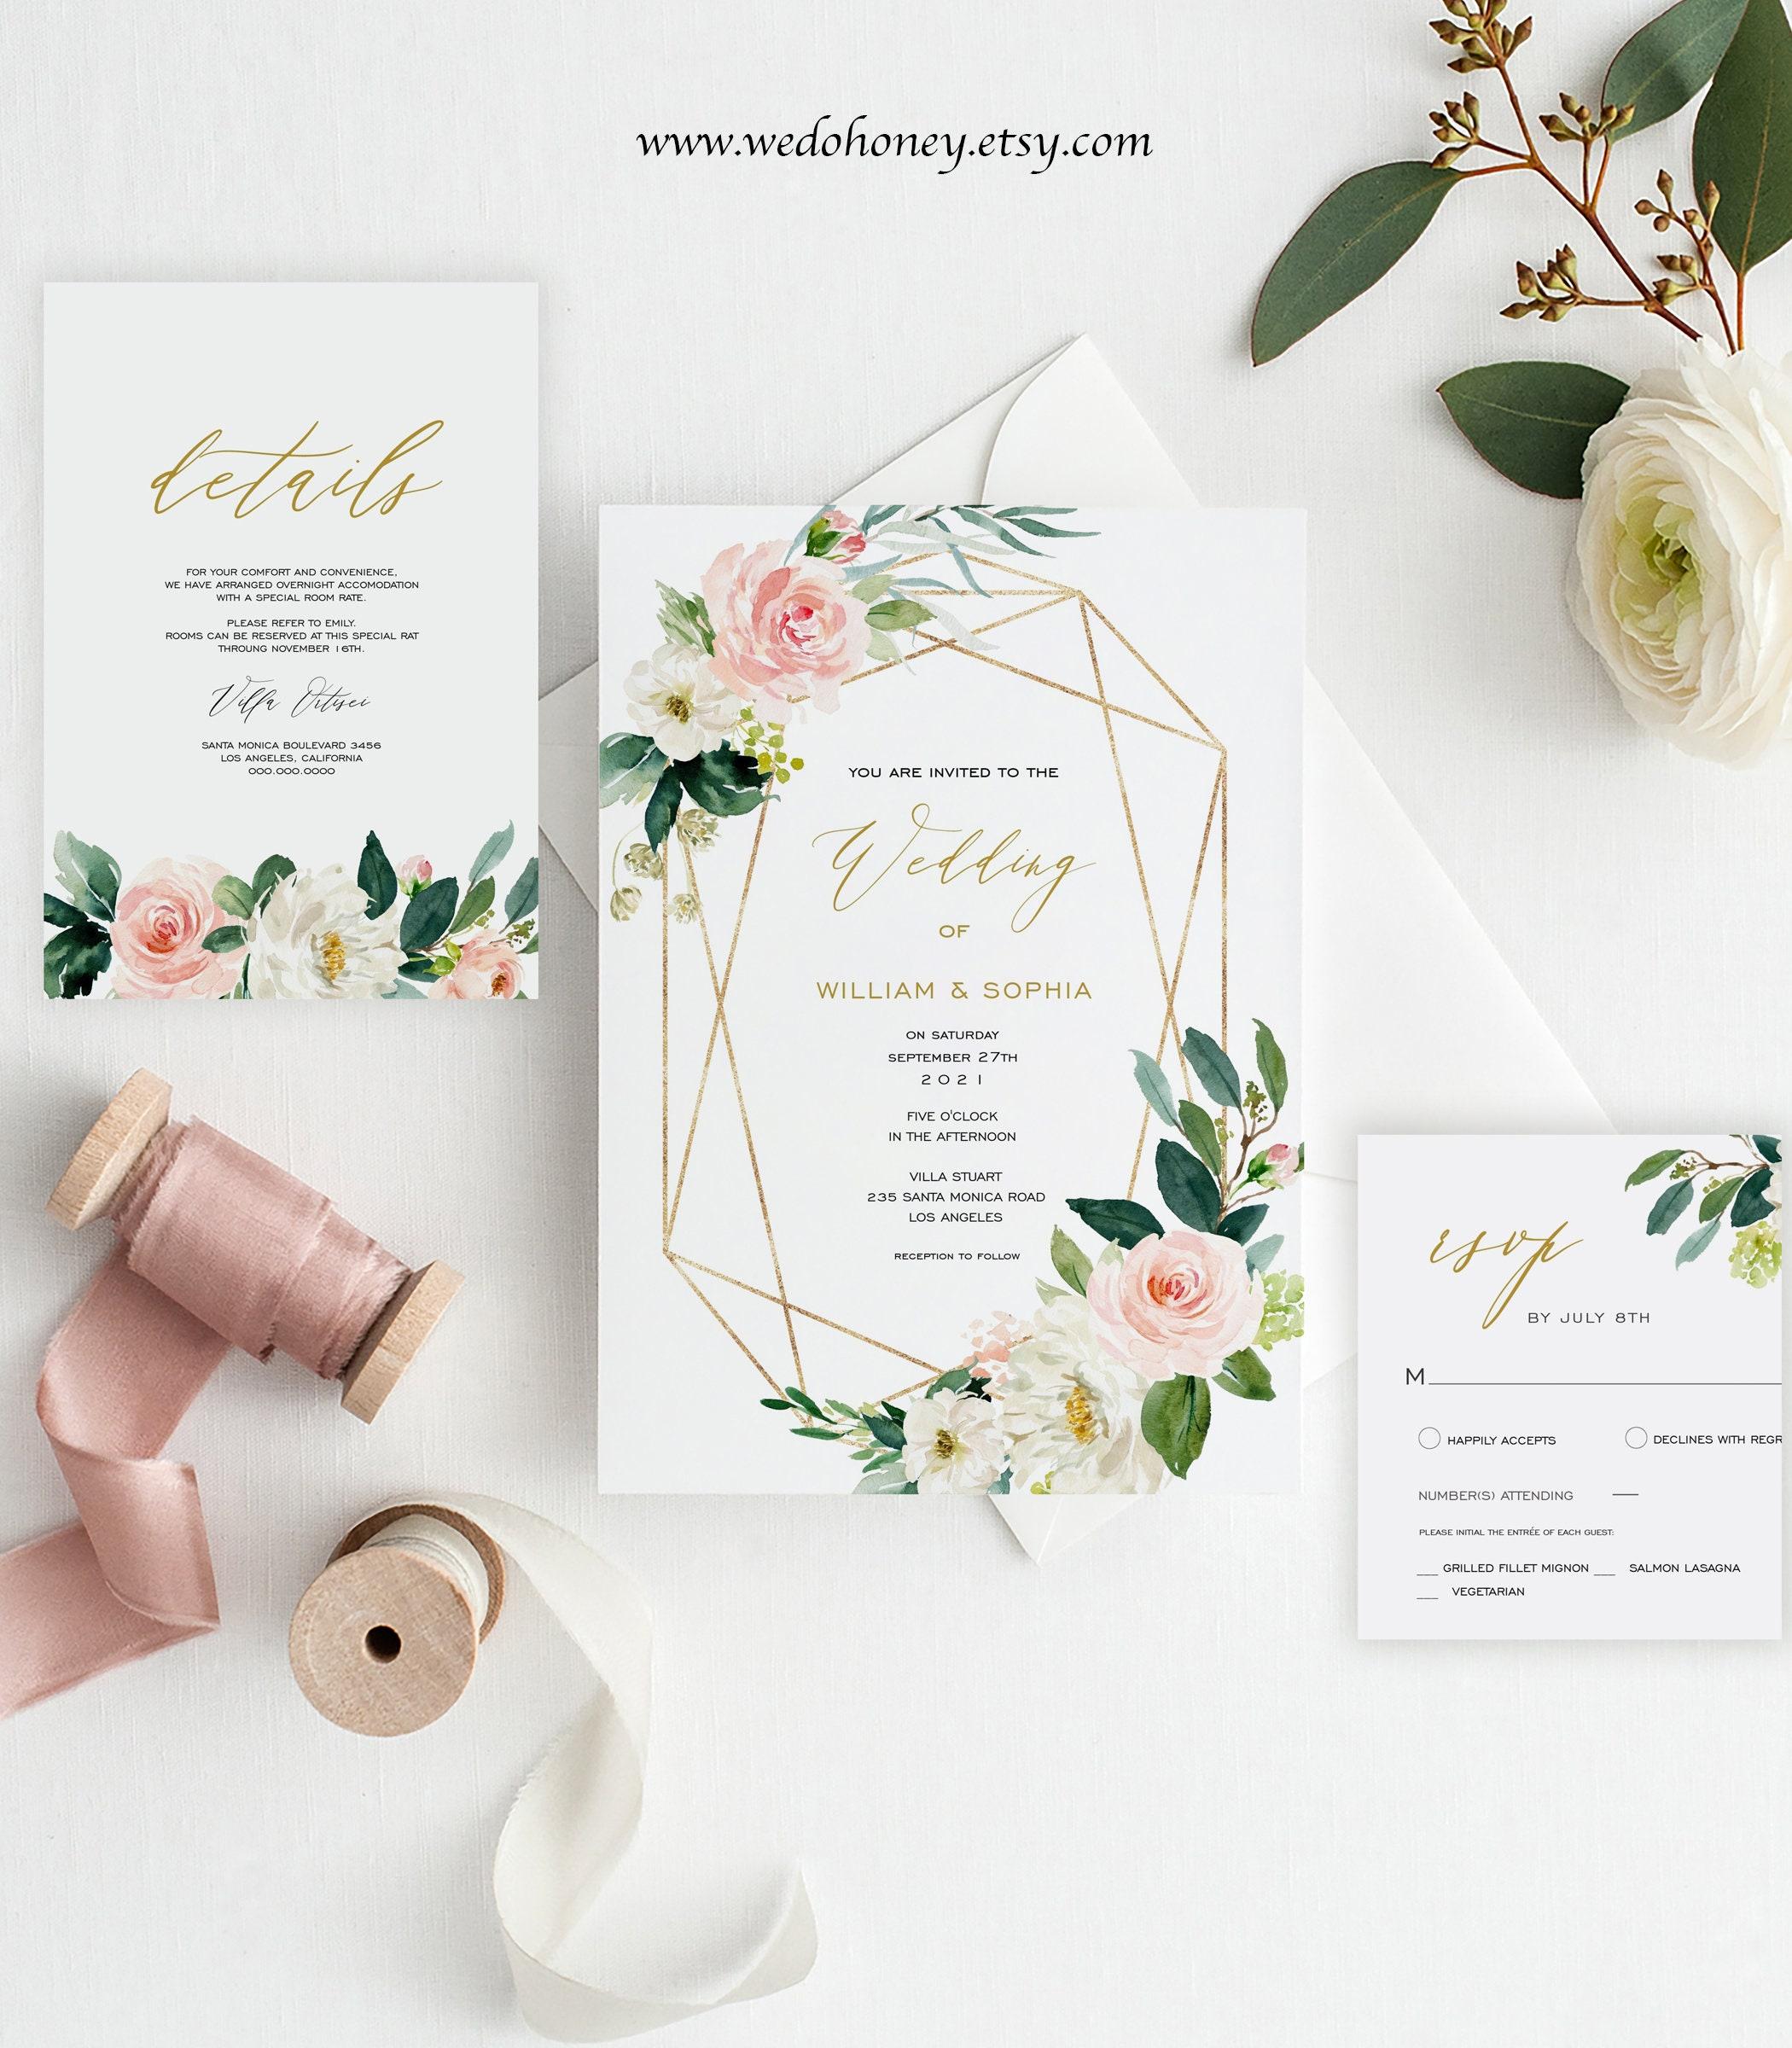 Template Wedding Invitation Suite, Printable Set Cards, RSVP, Details Insert, Gold Blush Floral, Editable Text with Corjl #059